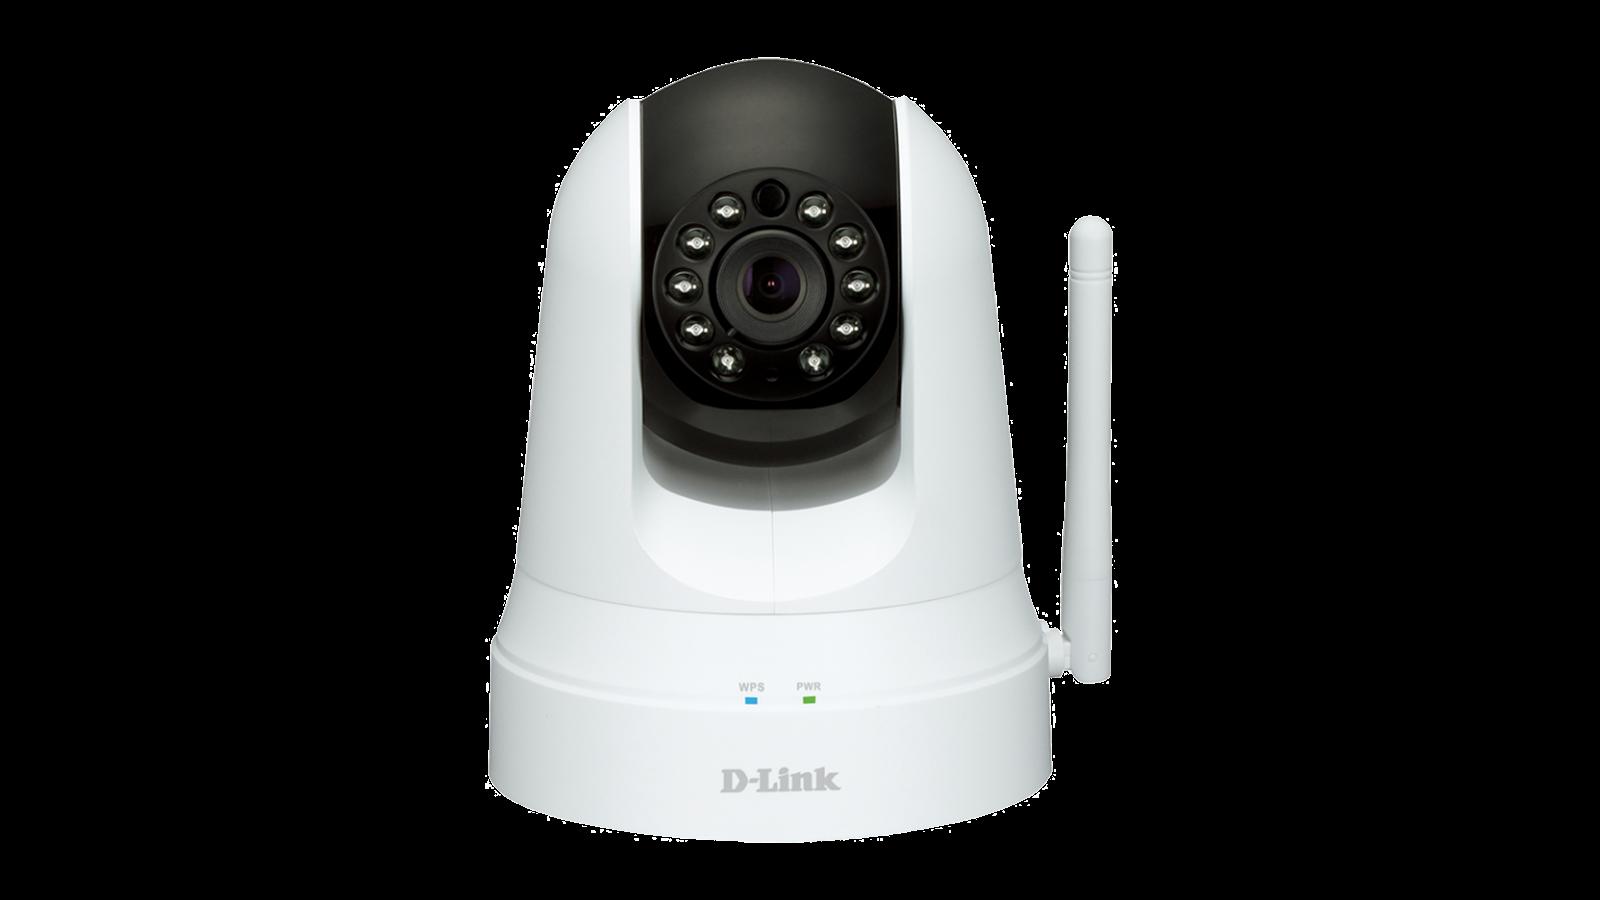 Videocámara D-Link DCS-933L